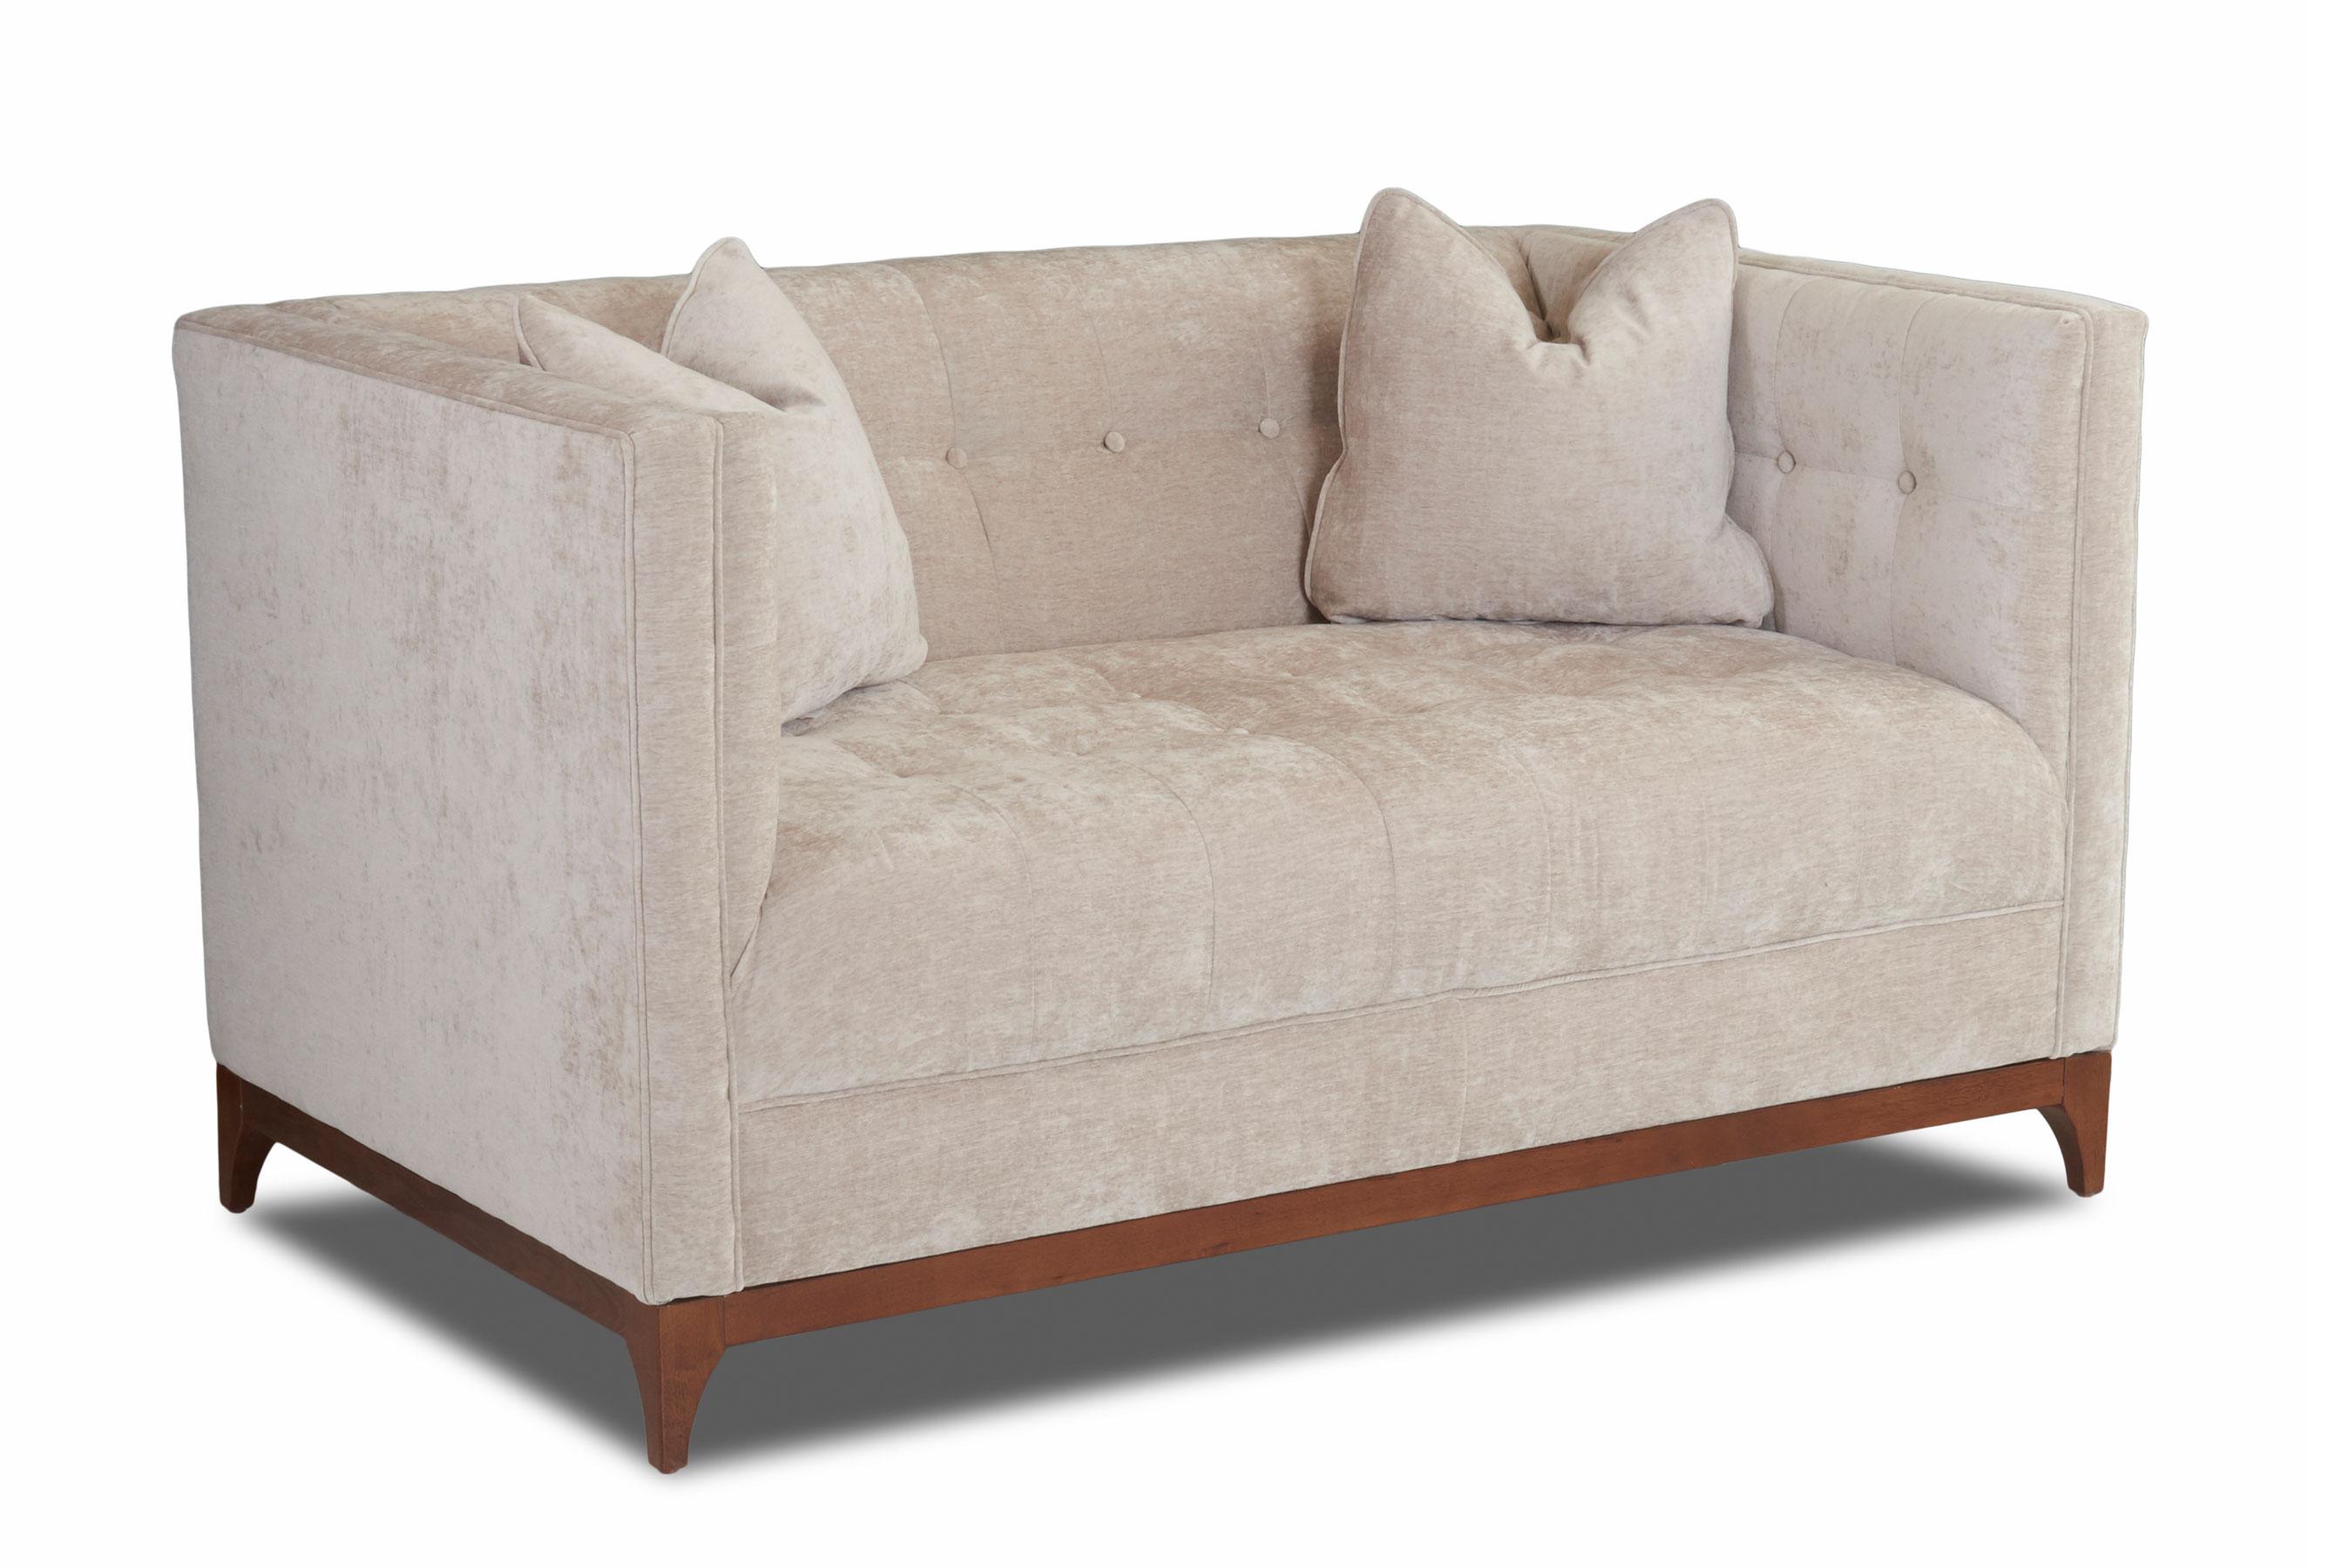 Admirable Boulevard 86 Sofa W Down Cushions Sofas And Sectionals Inzonedesignstudio Interior Chair Design Inzonedesignstudiocom